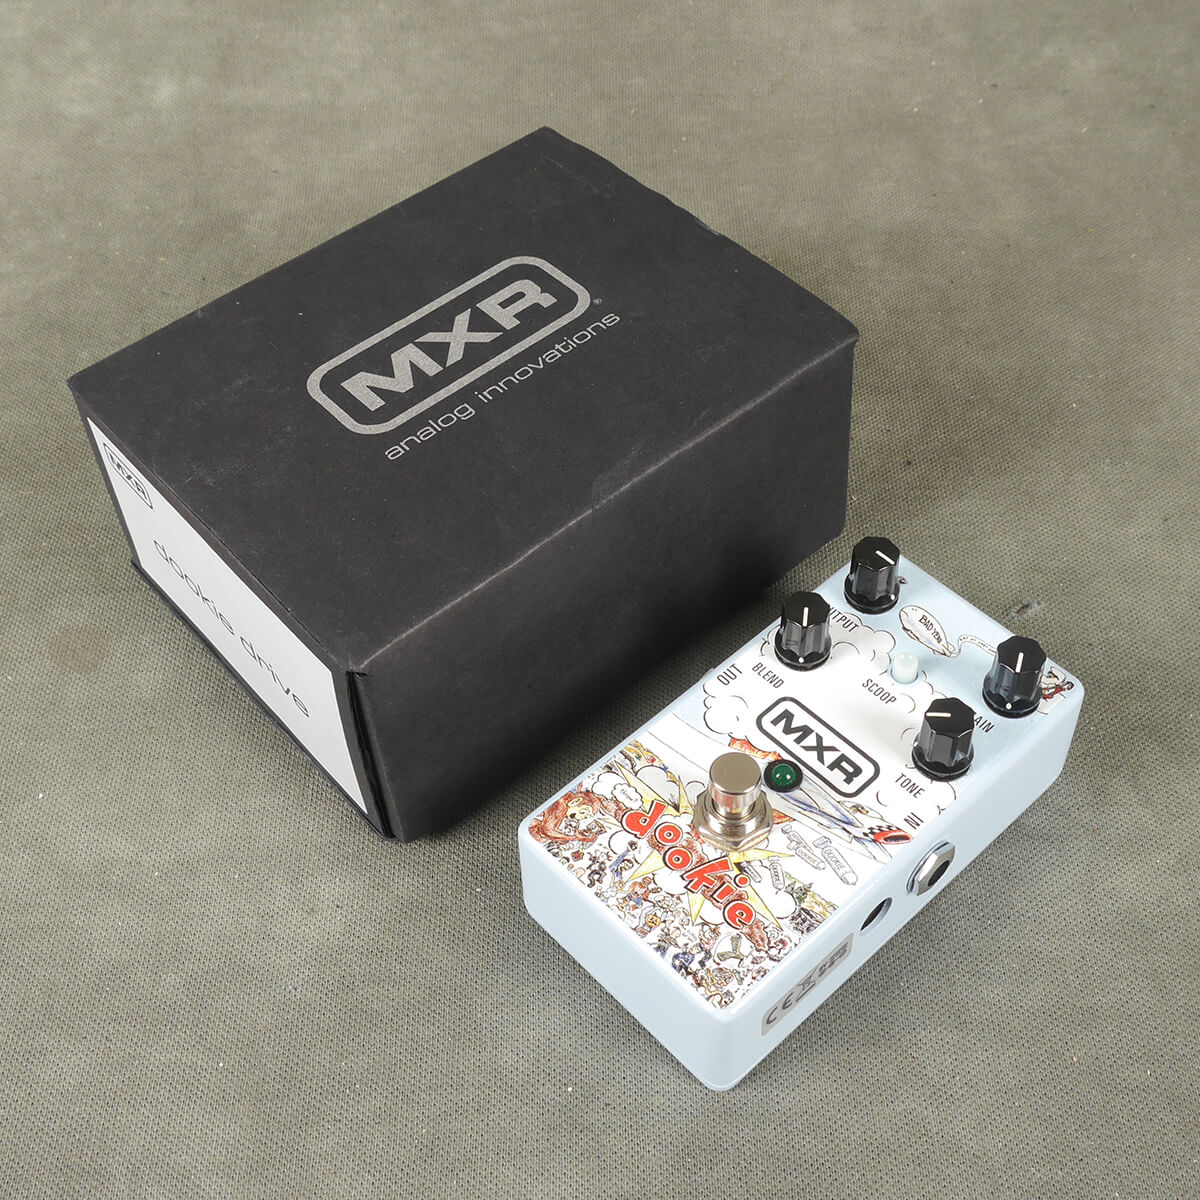 MXR Ver 1 Dookie Drive FX Pedal w/Box - 2nd Hand